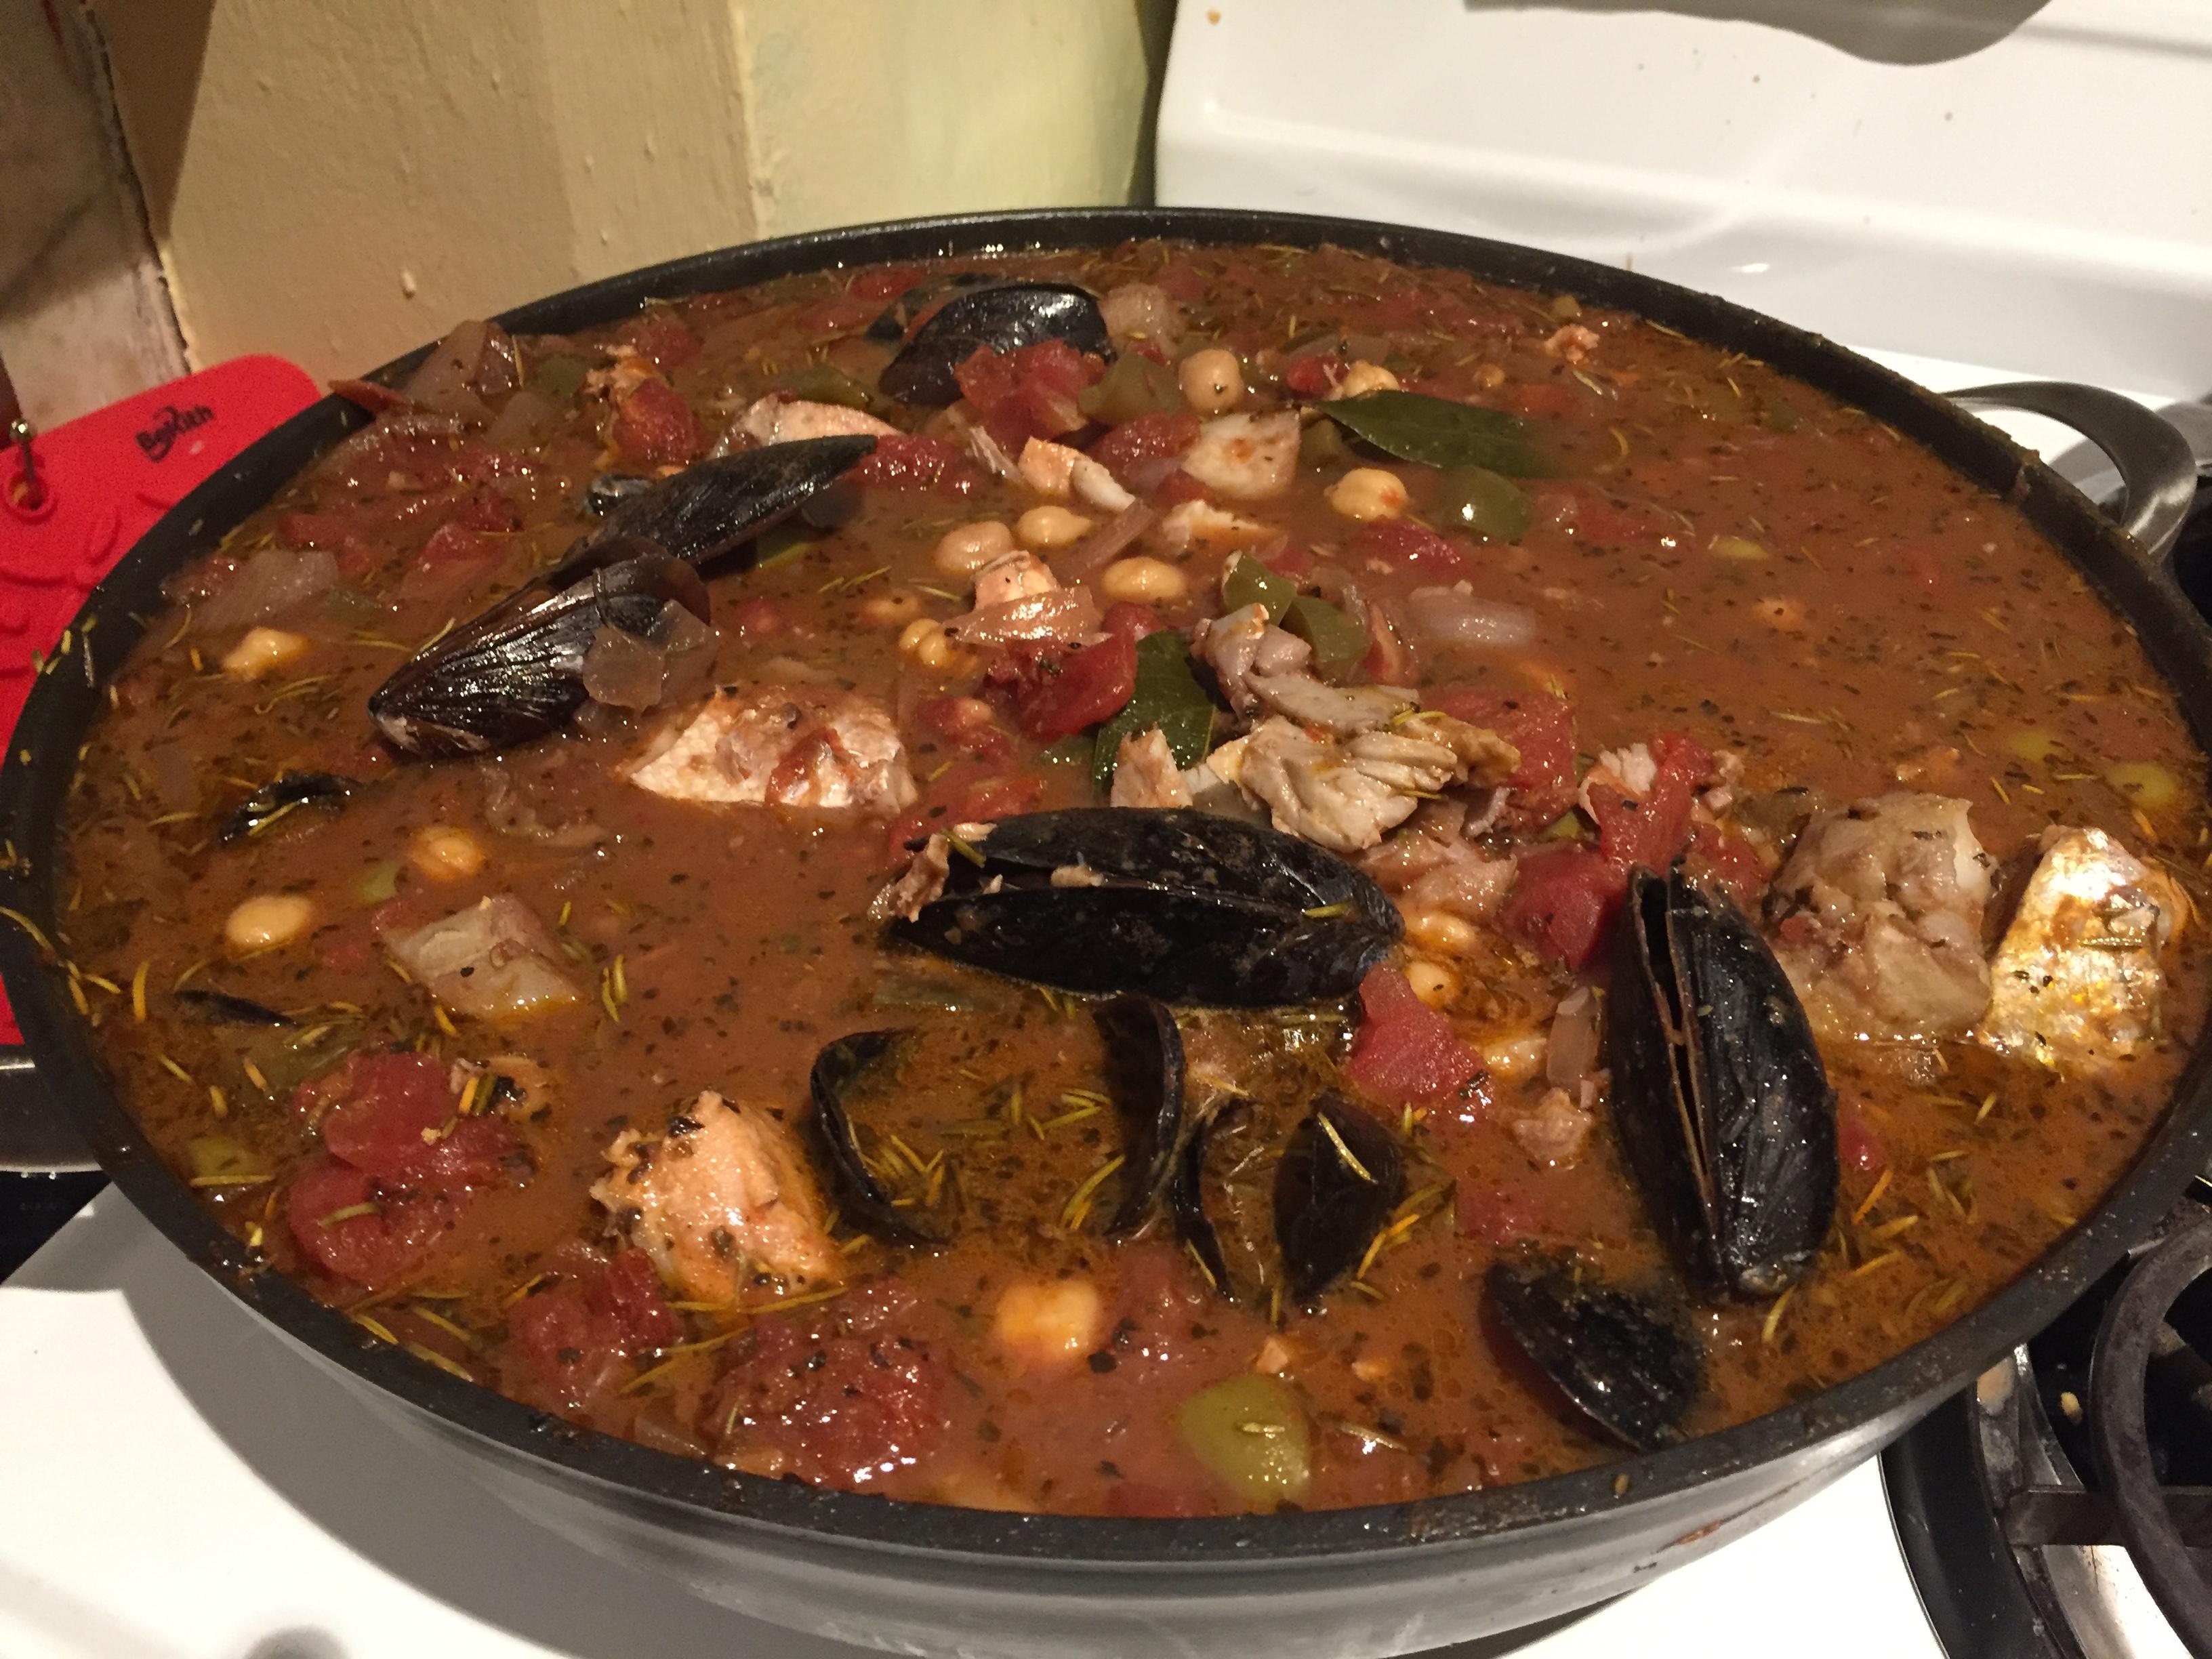 Tomato-Rich Fish Stew